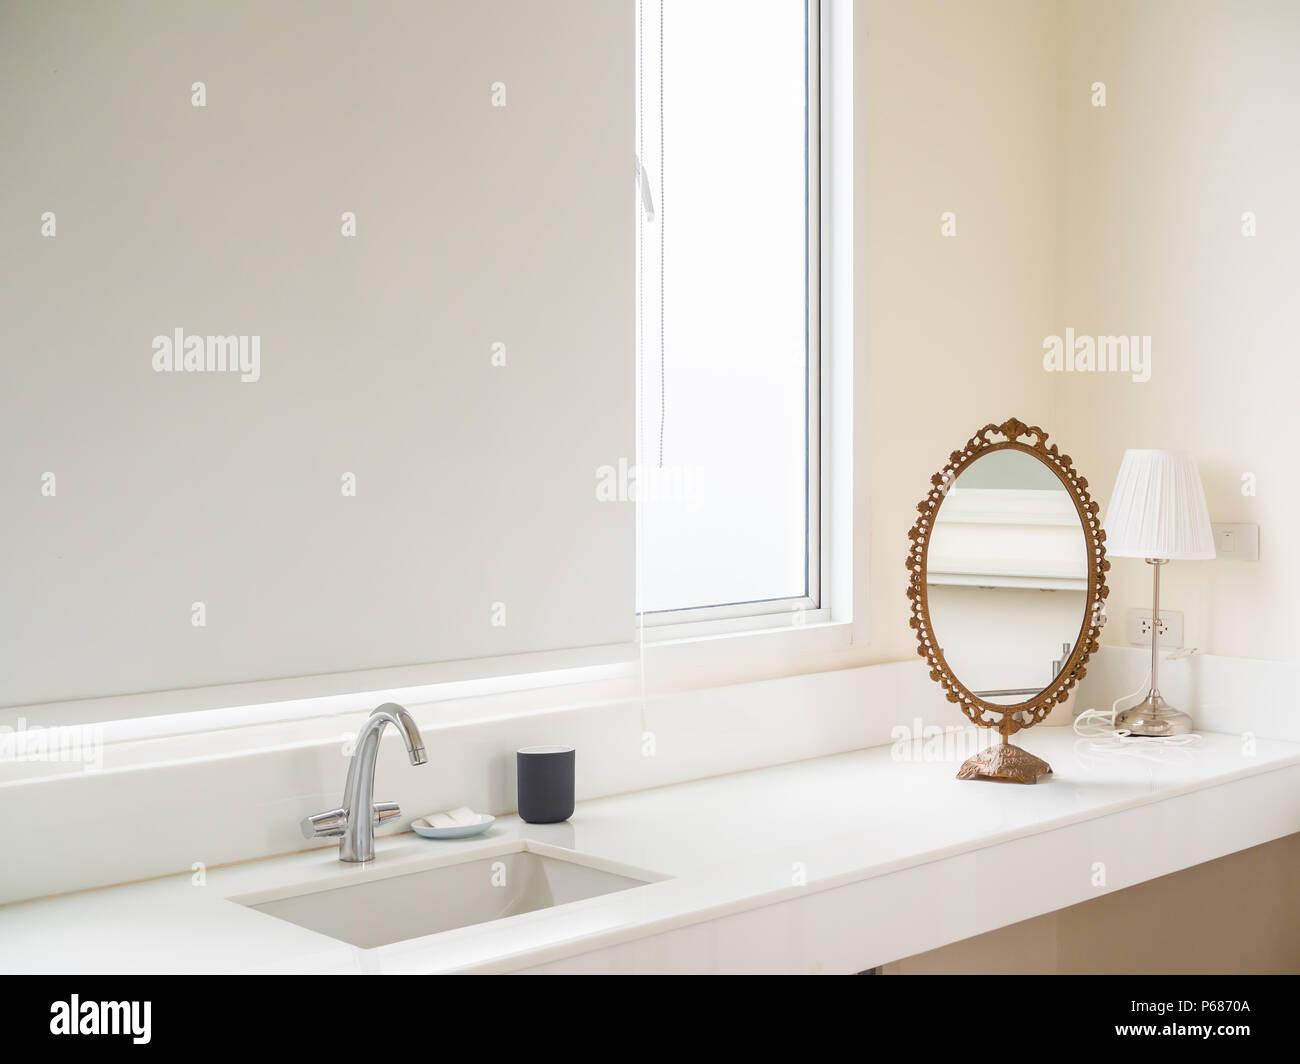 Clean White Bathroom Interior with Sink Basin Faucet, Vintage Mirror ...